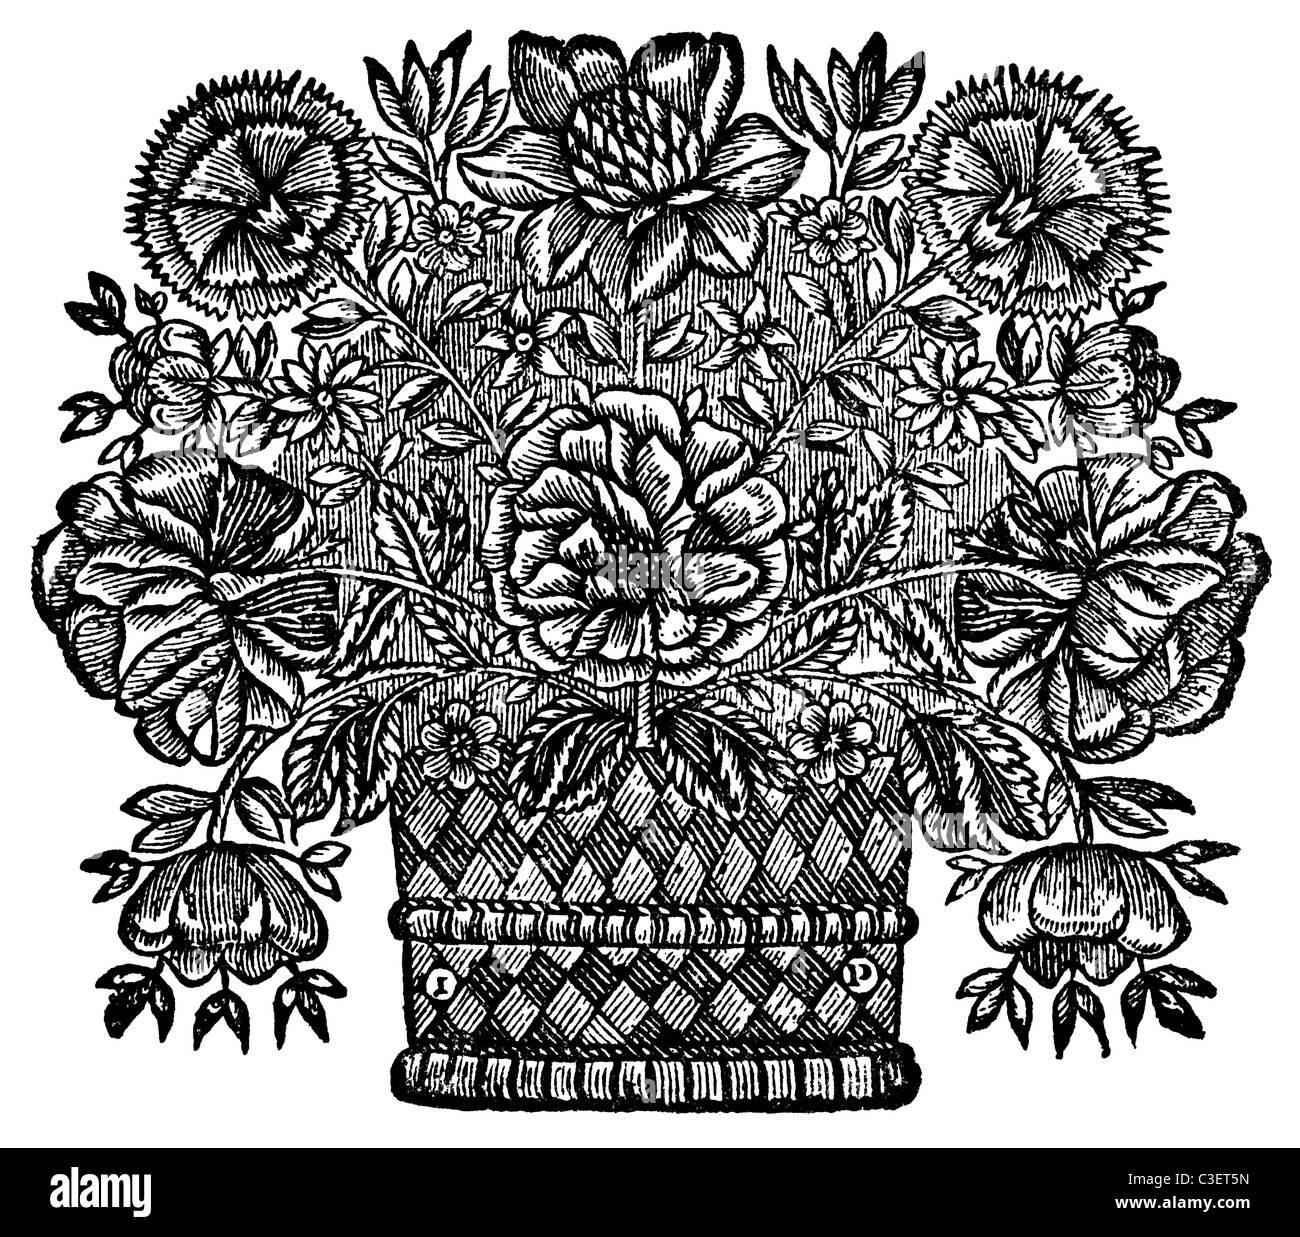 Xilogravura Medieval de flor cesta Imagens de Stock